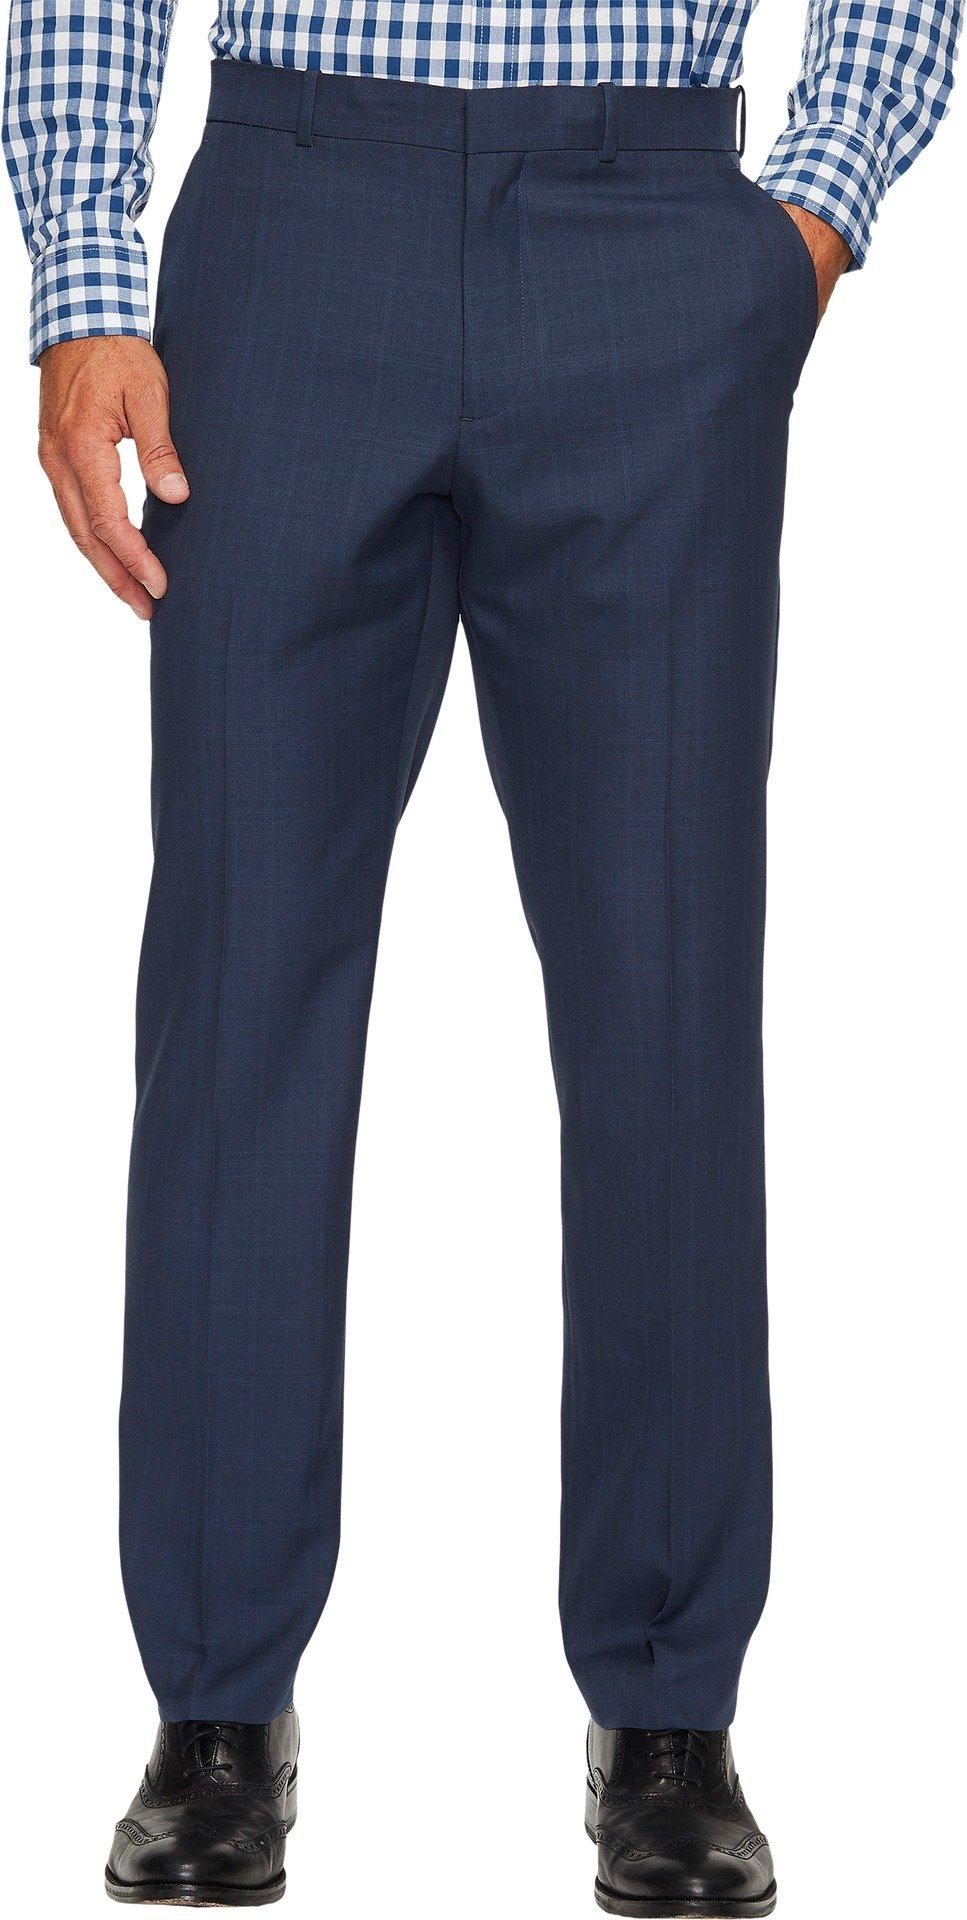 Perry Ellis Men's Portfolio Modern Fit Performance Pant, Mood Indigo, 36x32